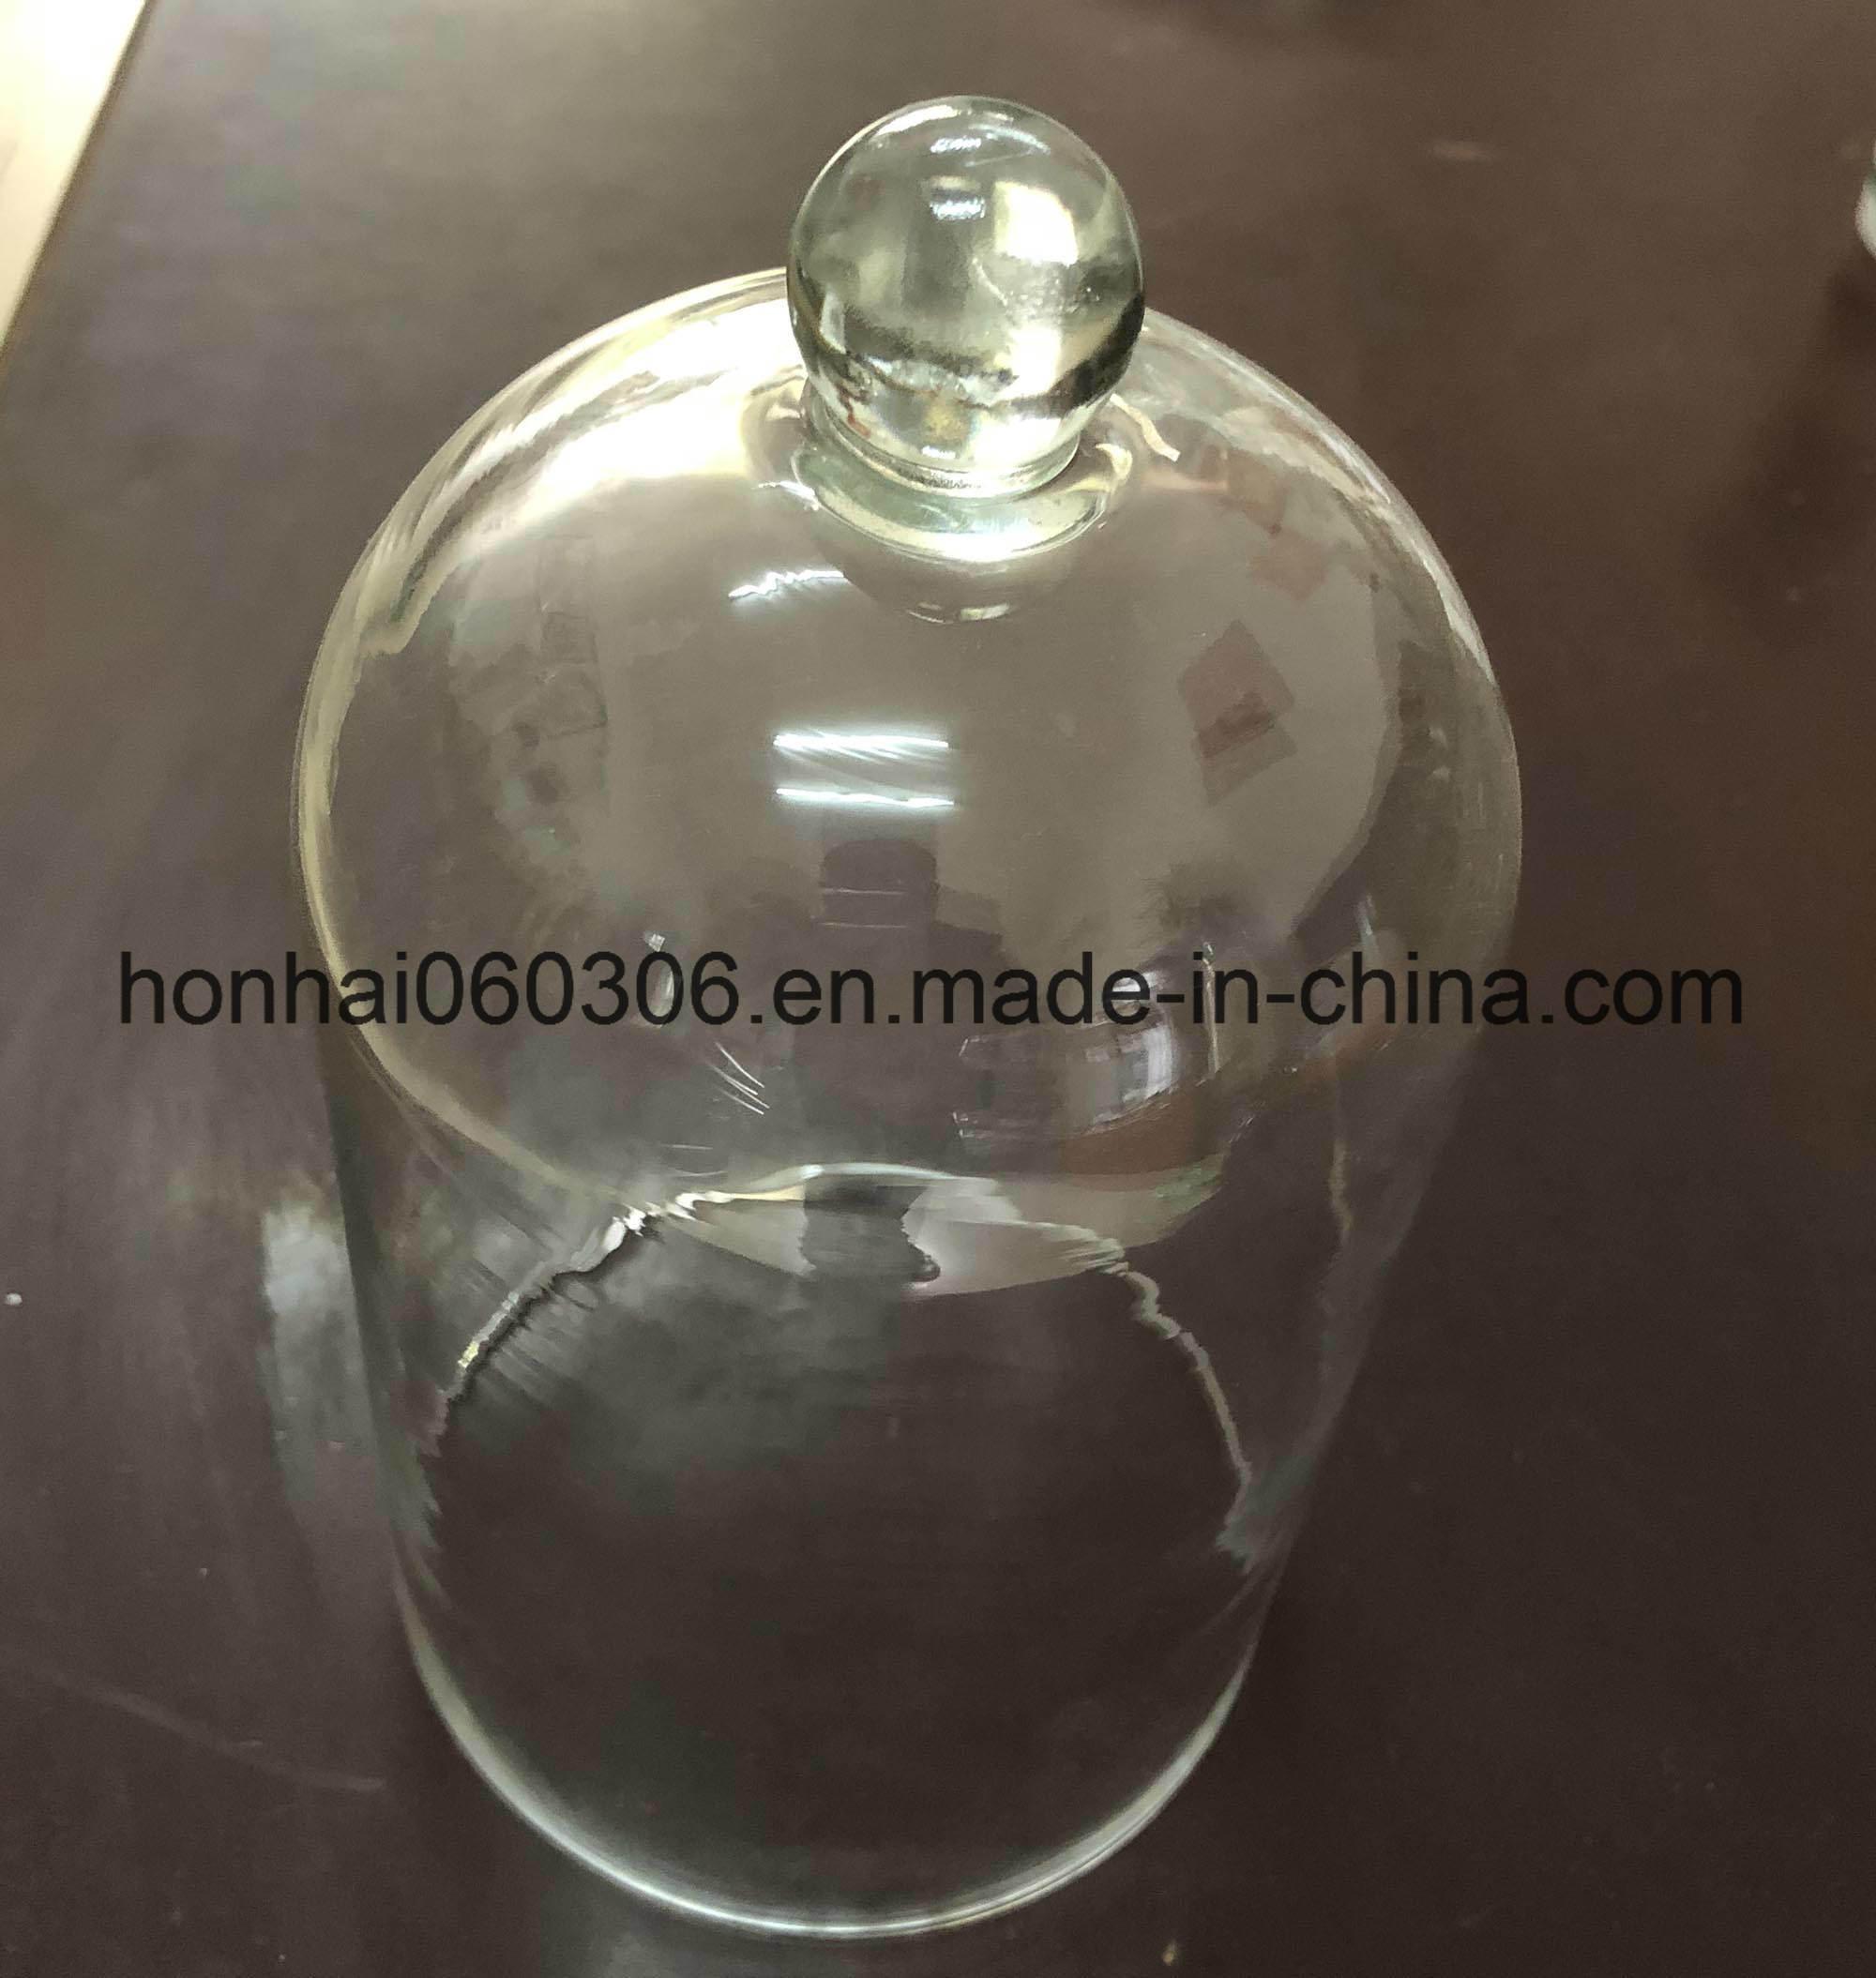 Hot Item Decorative Clear Glass Dome Cloche Bell Succulent Terrariums Air Plant Covers